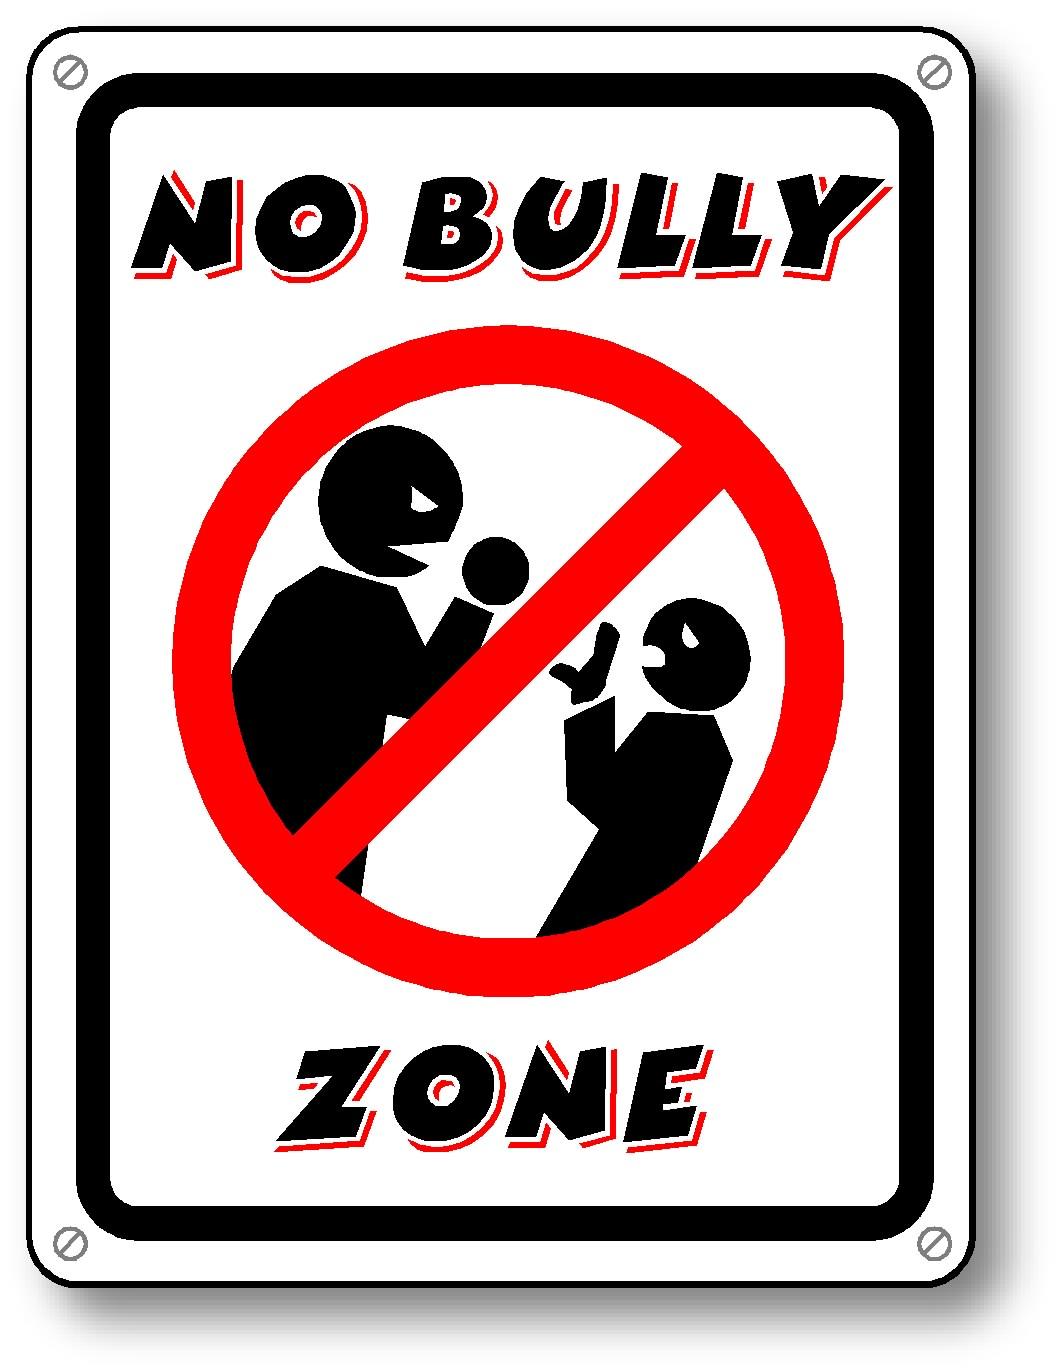 bullying.jpg (1063×1371)